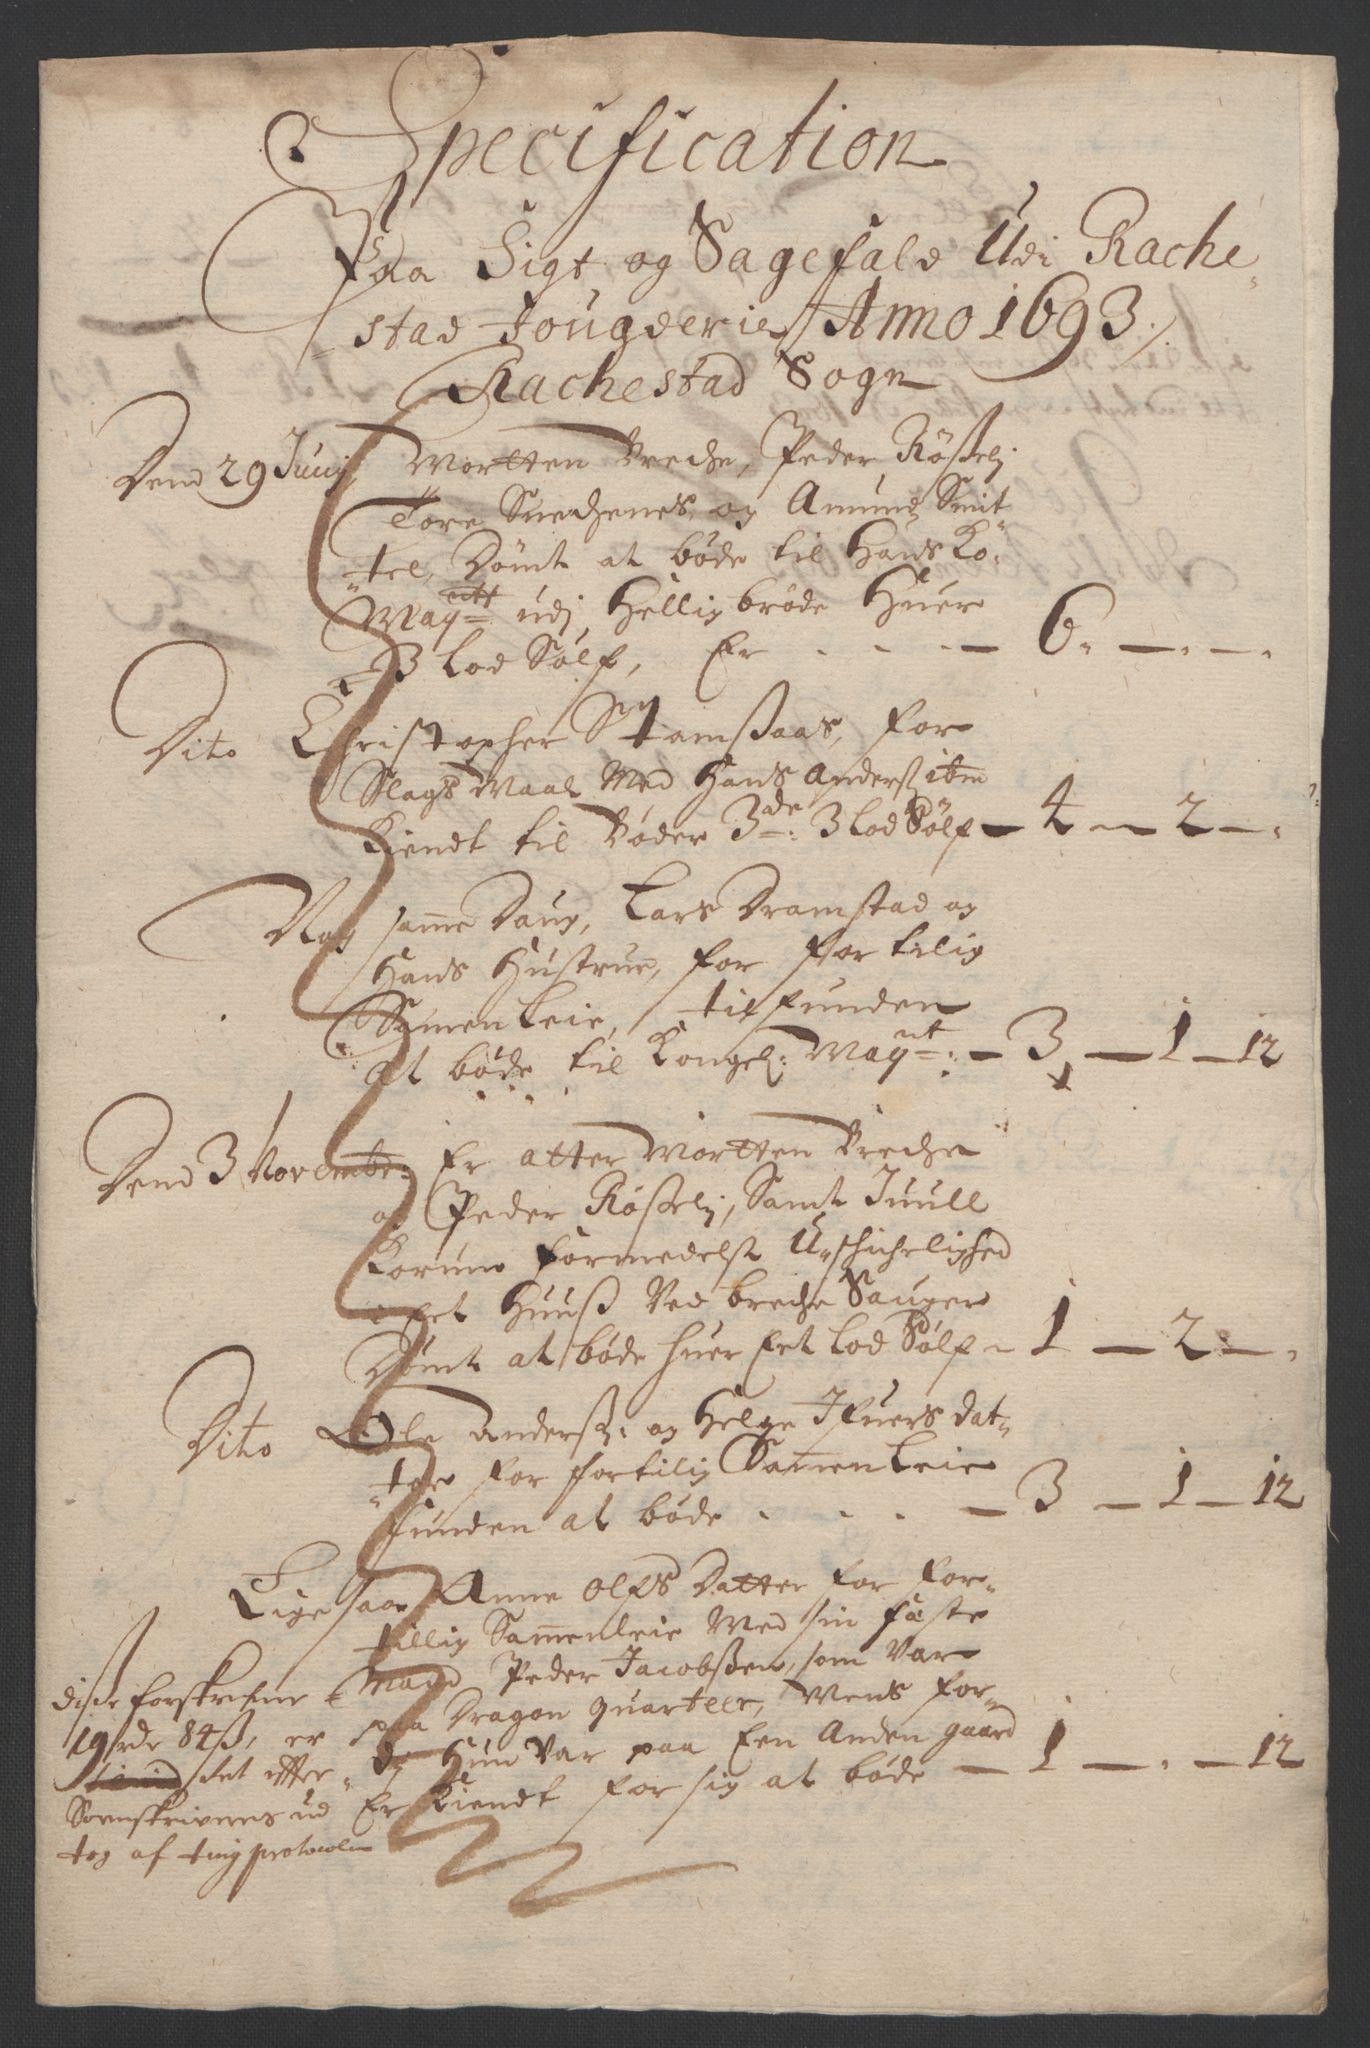 RA, Rentekammeret inntil 1814, Reviderte regnskaper, Fogderegnskap, R05/L0278: Fogderegnskap Rakkestad, 1691-1693, s. 361